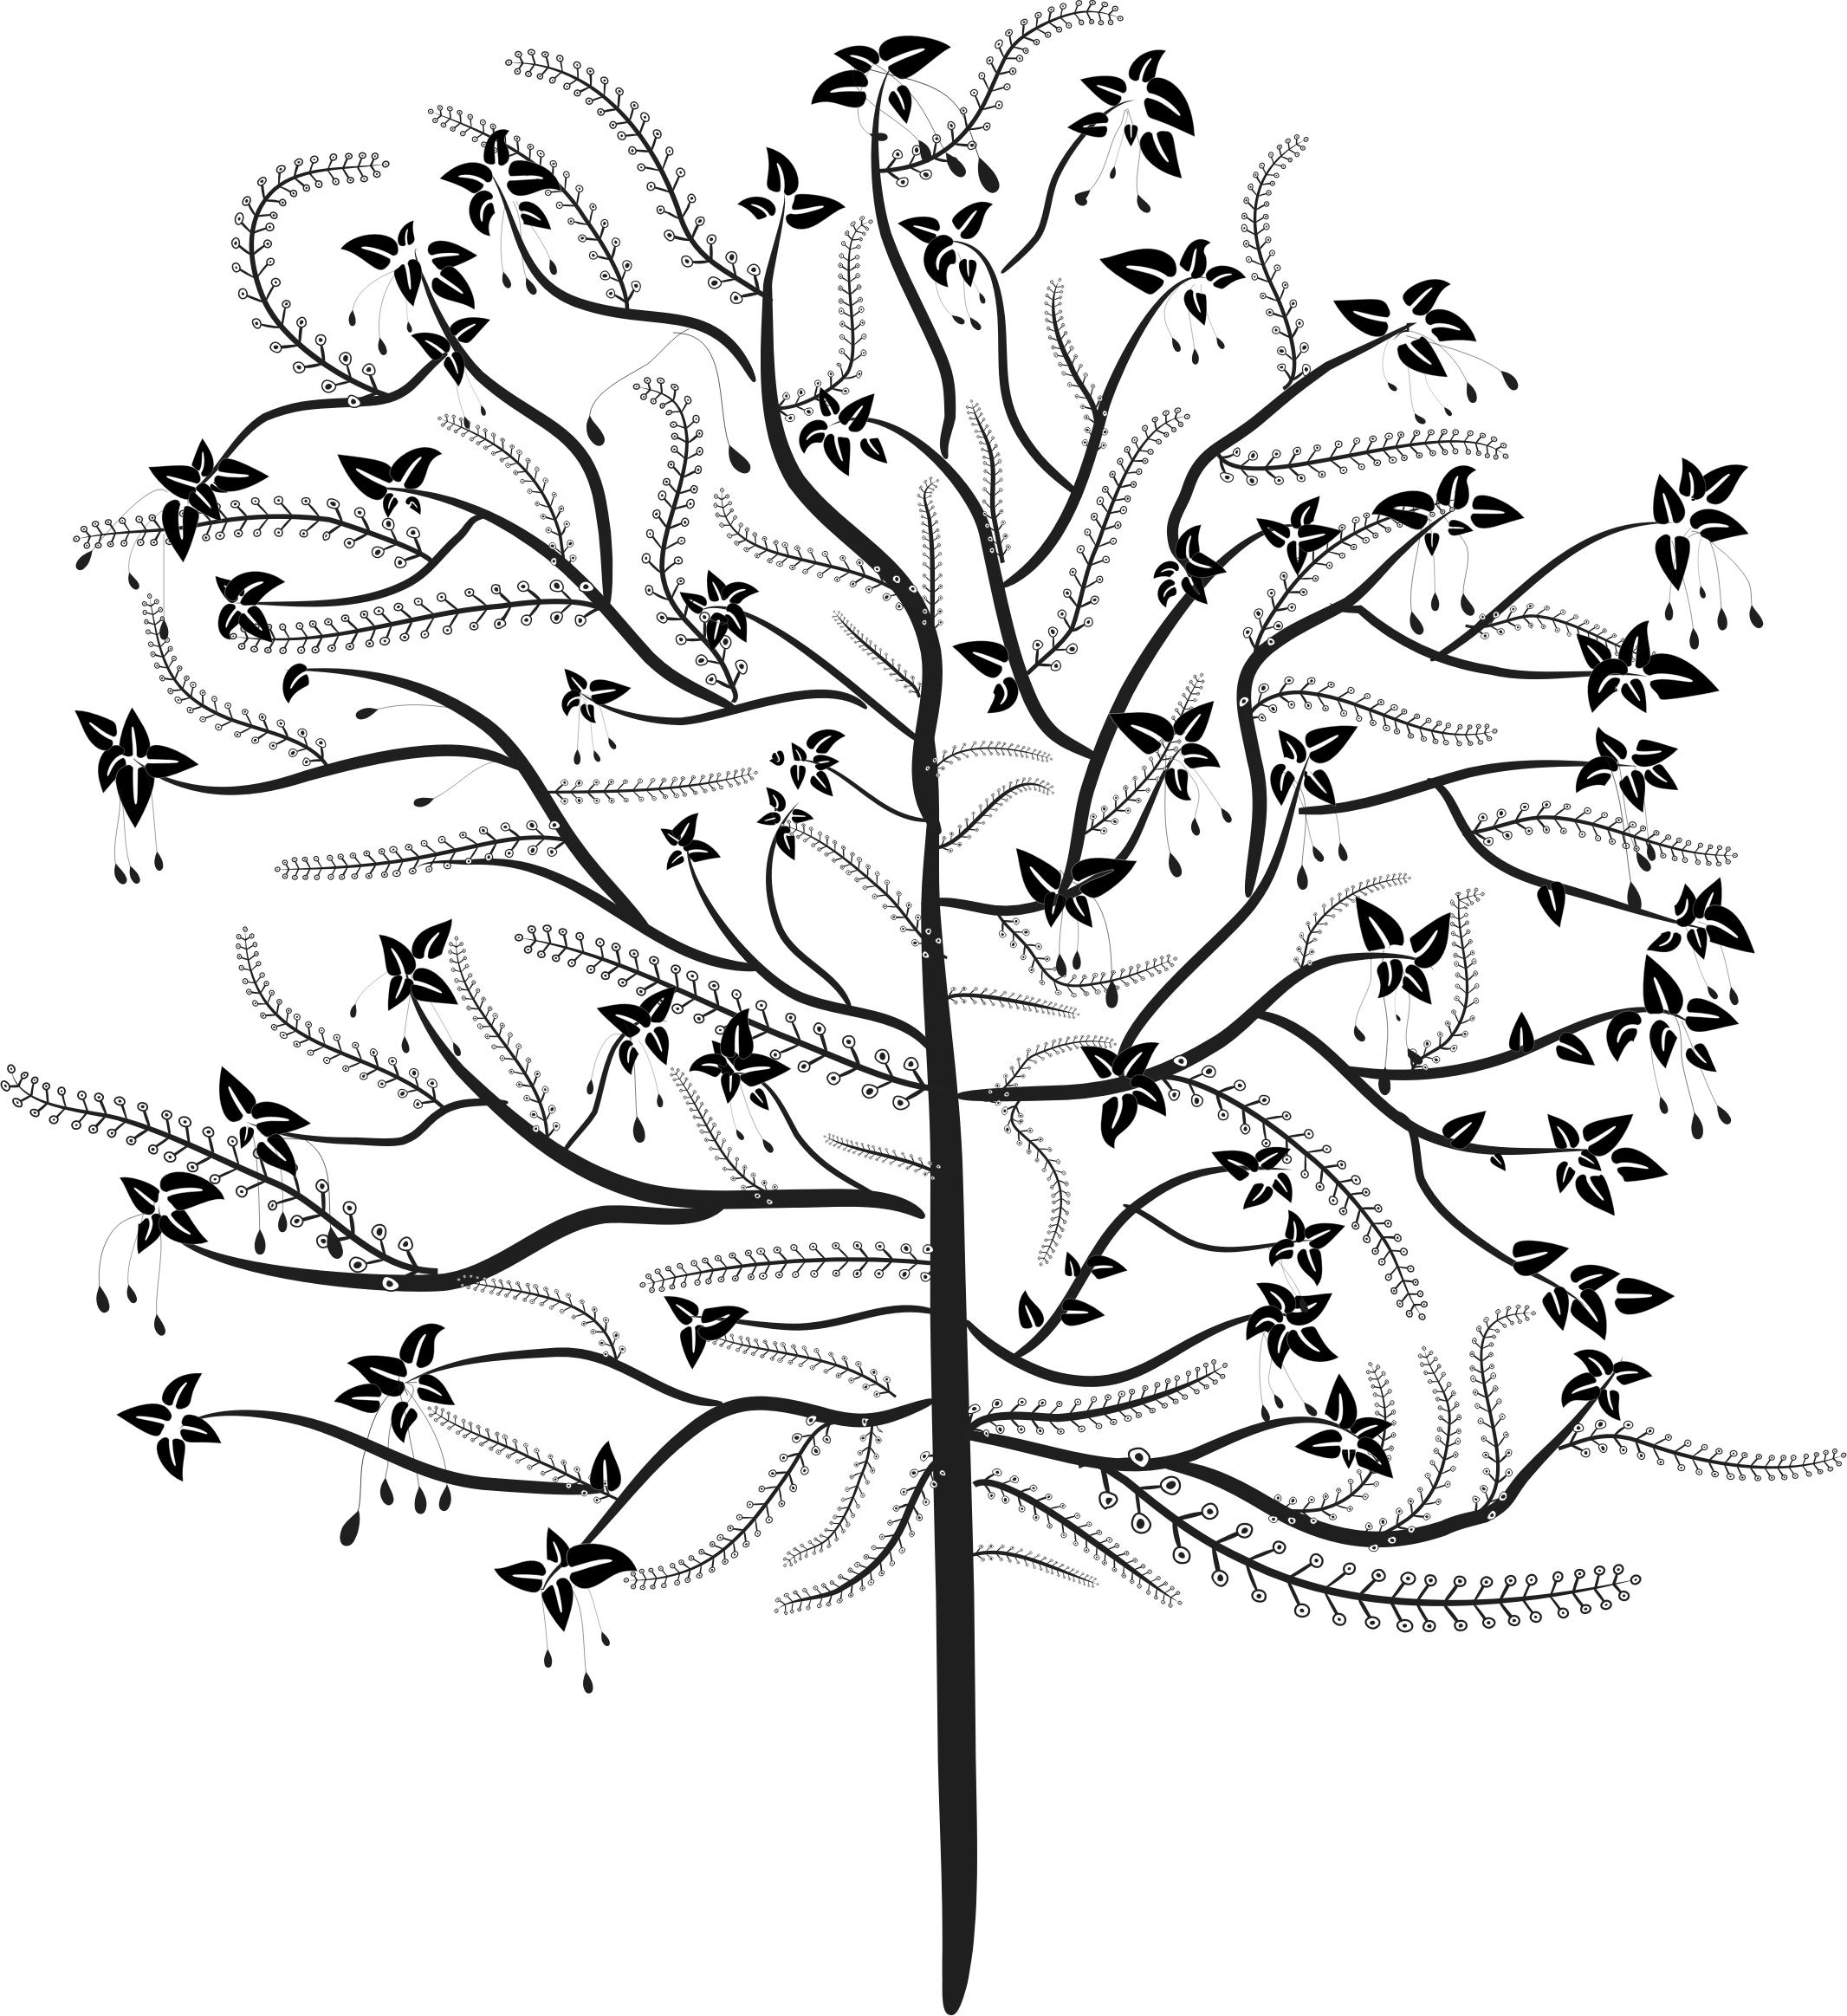 Stylized at getdrawings com. Koala clipart tree drawing